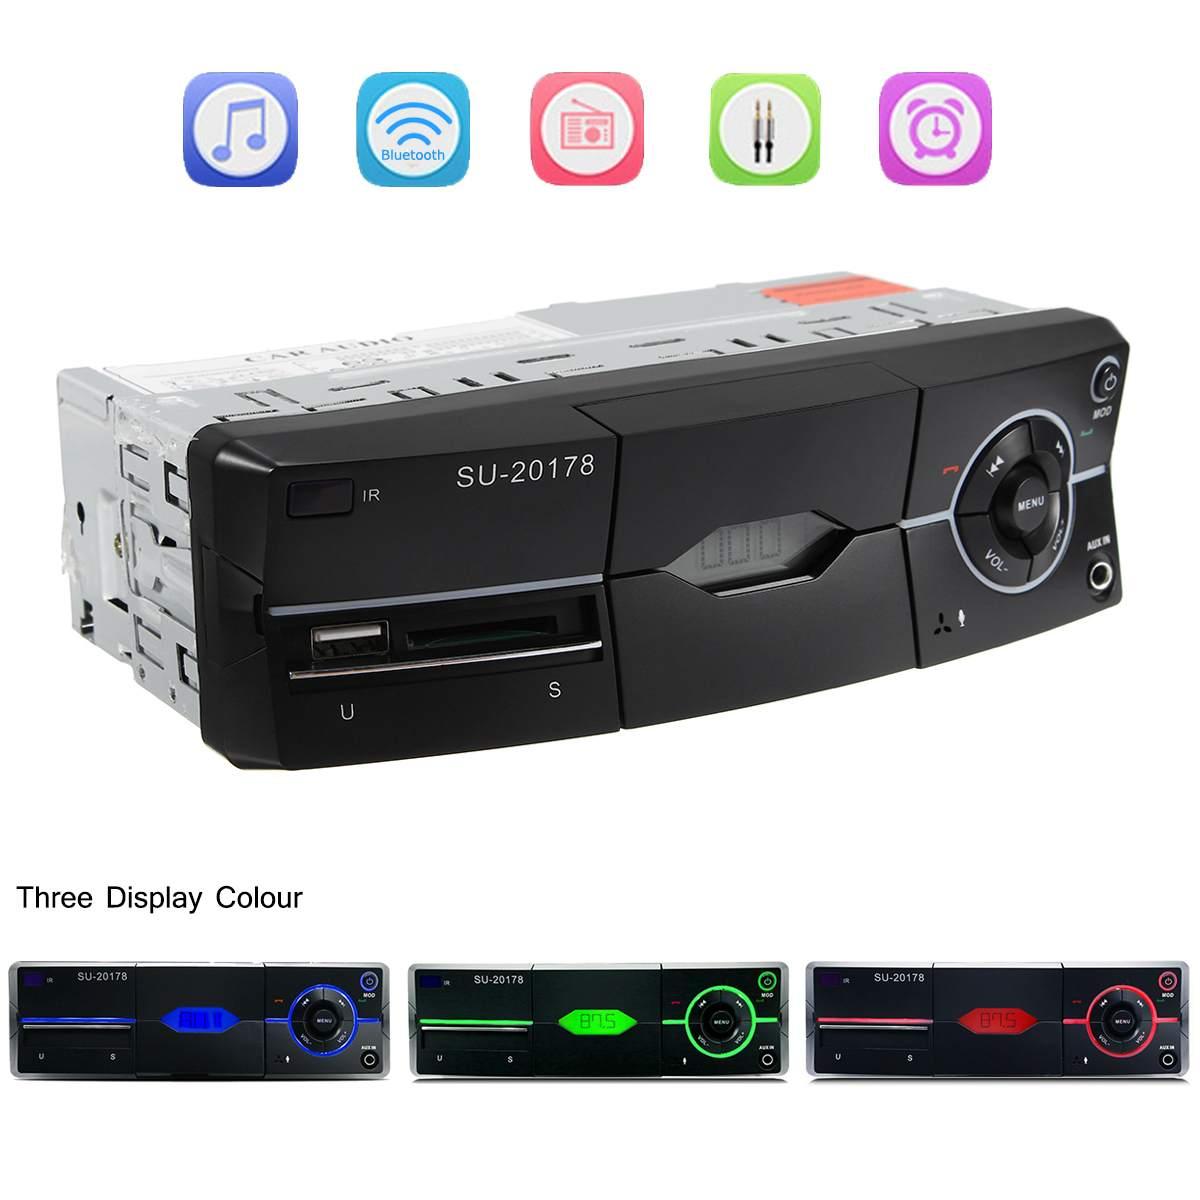 12V 1 DIN bluetooth Car Stereo FM Radio SD/USB/AUX-IN Remote Head Unit MP4 MP5 MP3 Audio Player USB SD MMC Port